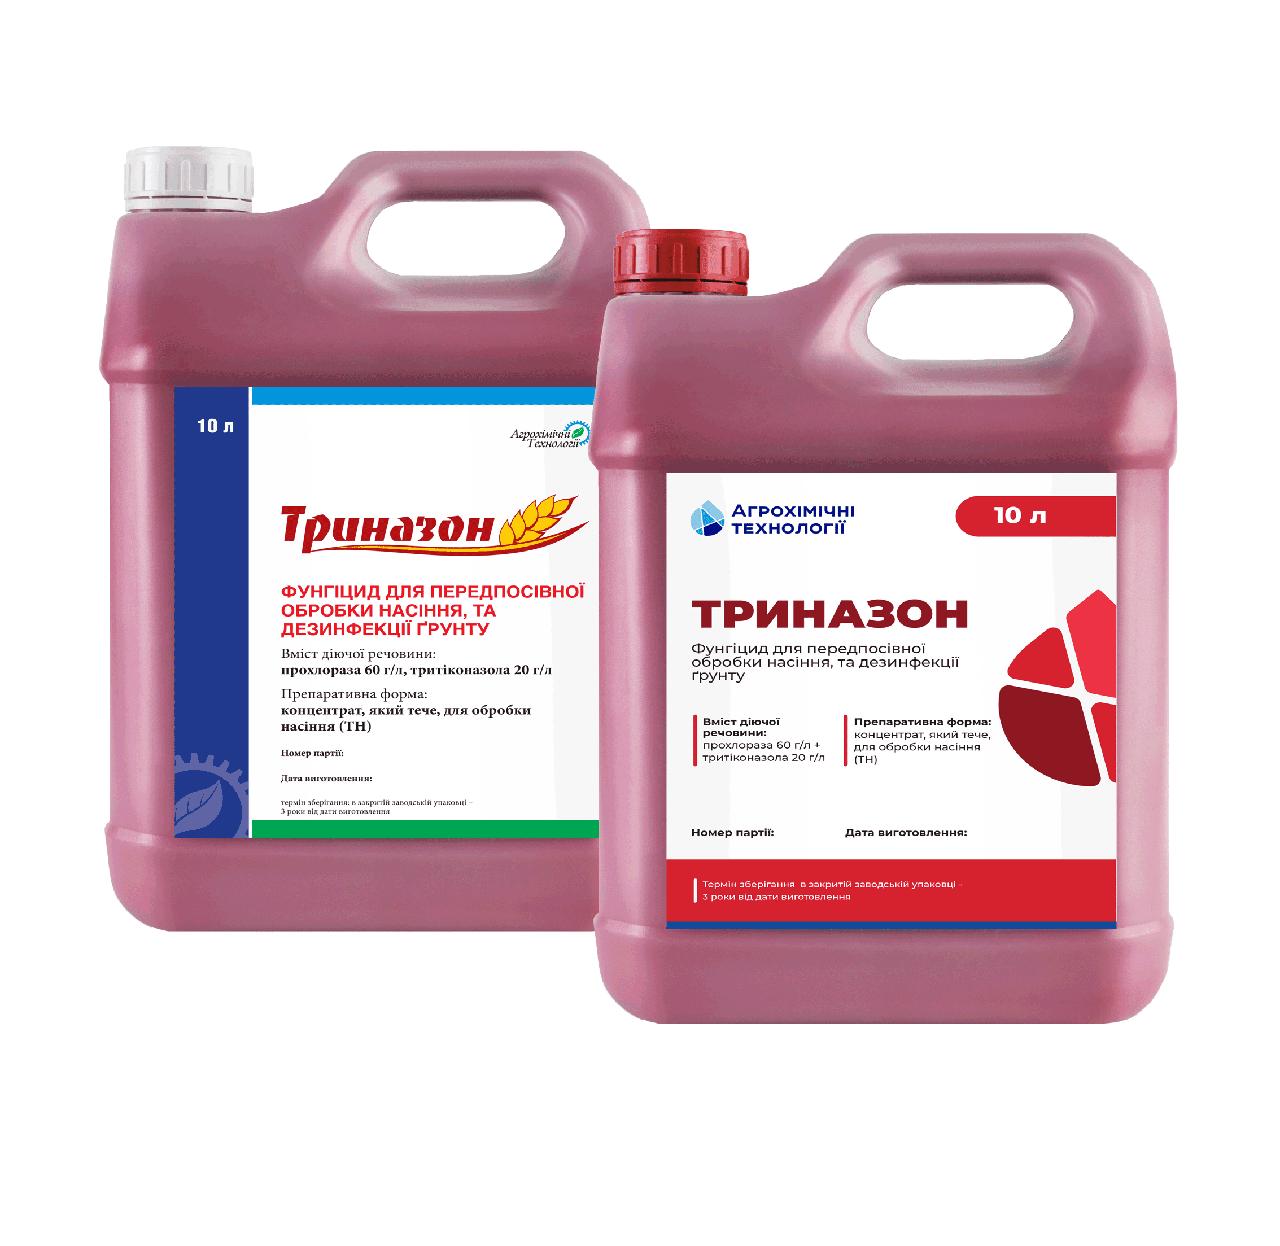 Протравитель Триназон ( протравитель Кинто Дуо ) тритиконазол, 20 г / л прохлораз, 60 г / л